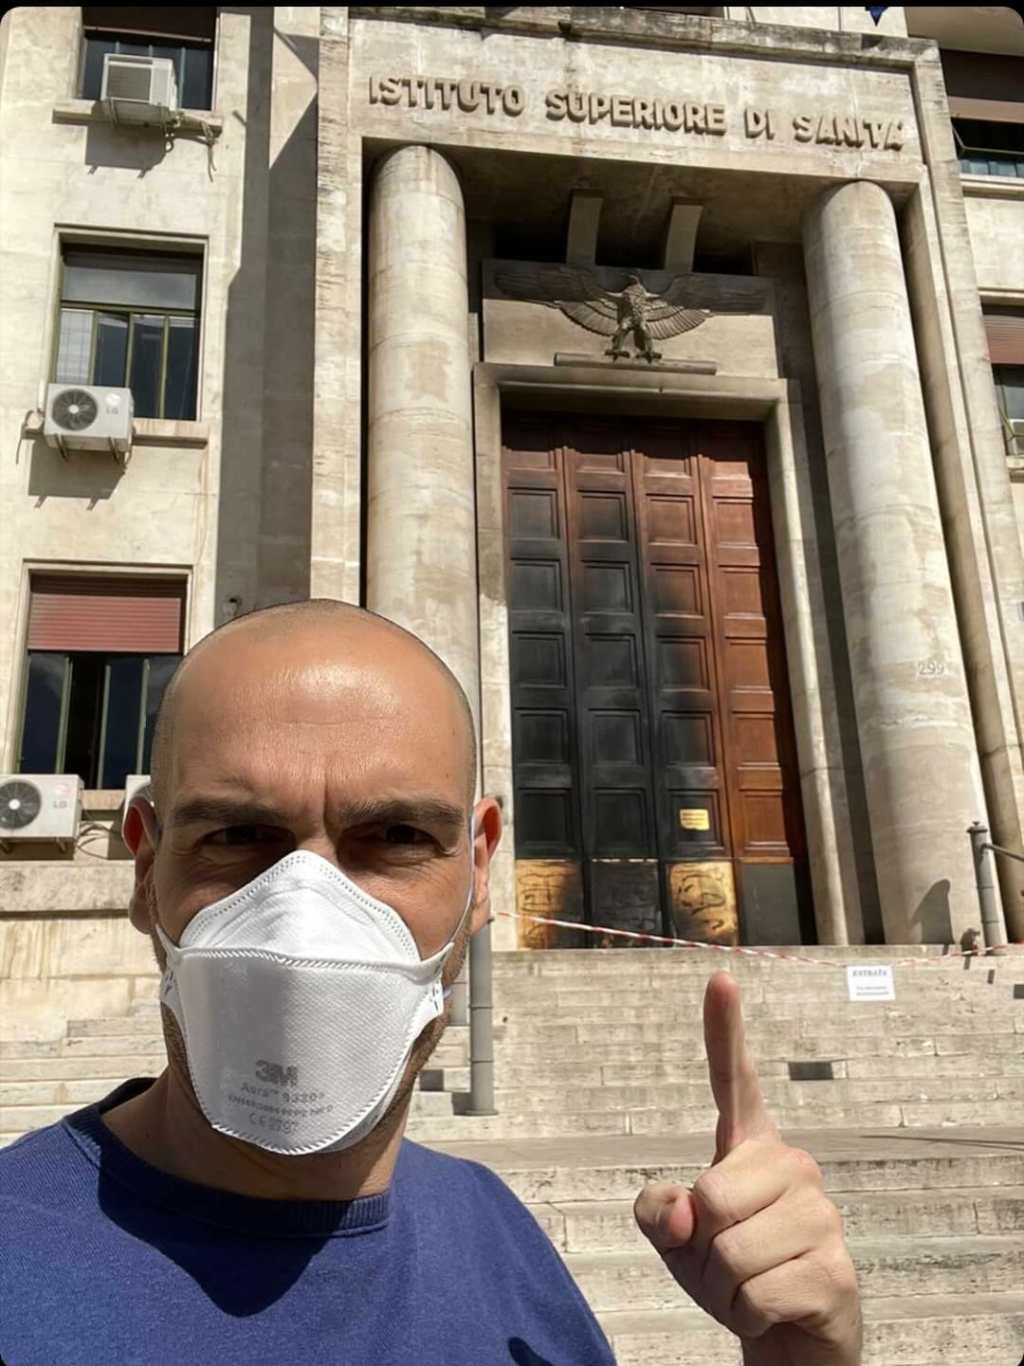 Alessandro Mustazzolu (Microbiologo digitAle)